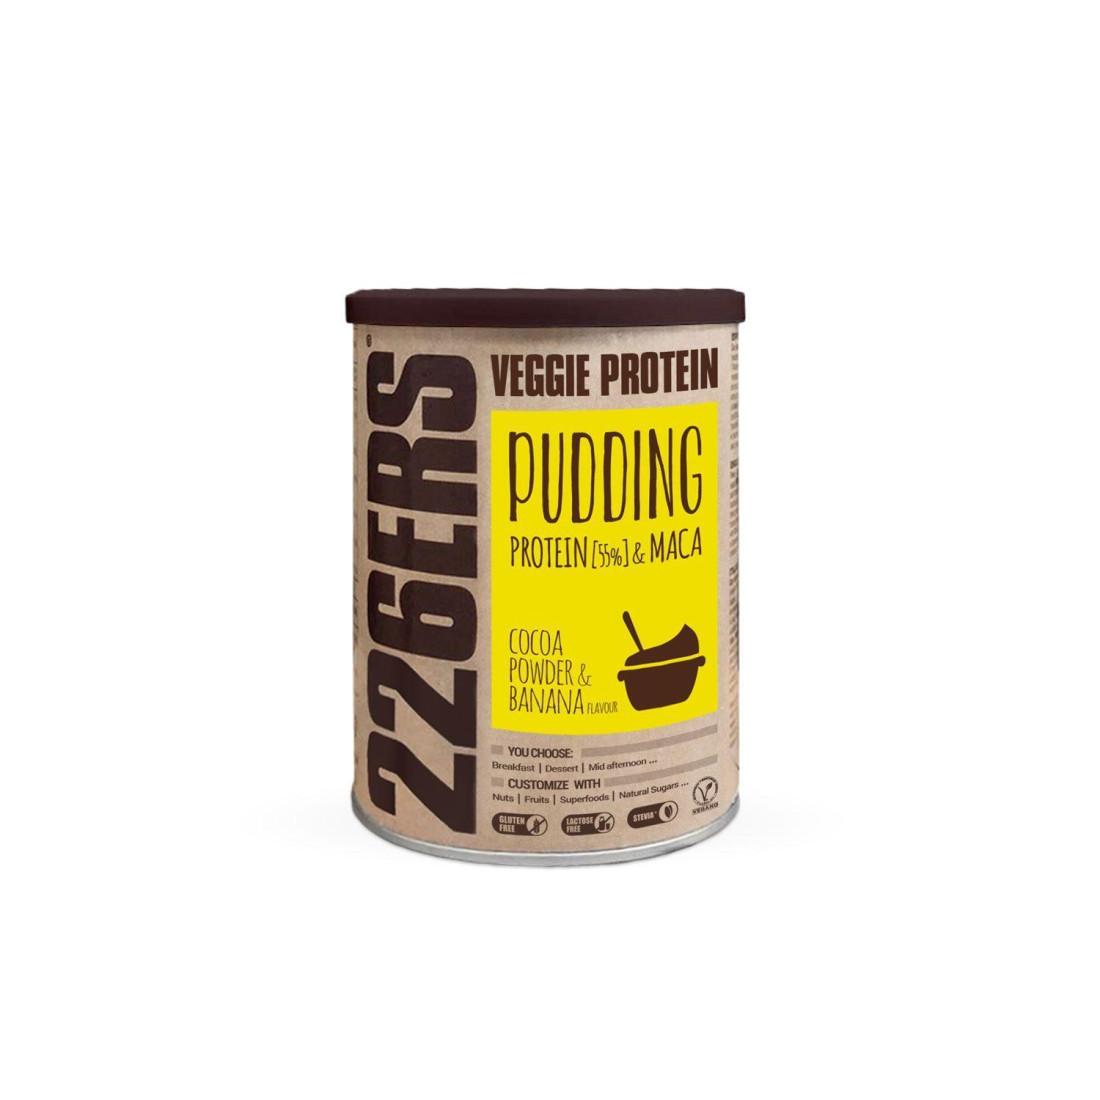 VEGGIE PROTEIN PUDDING - Pea Protein...